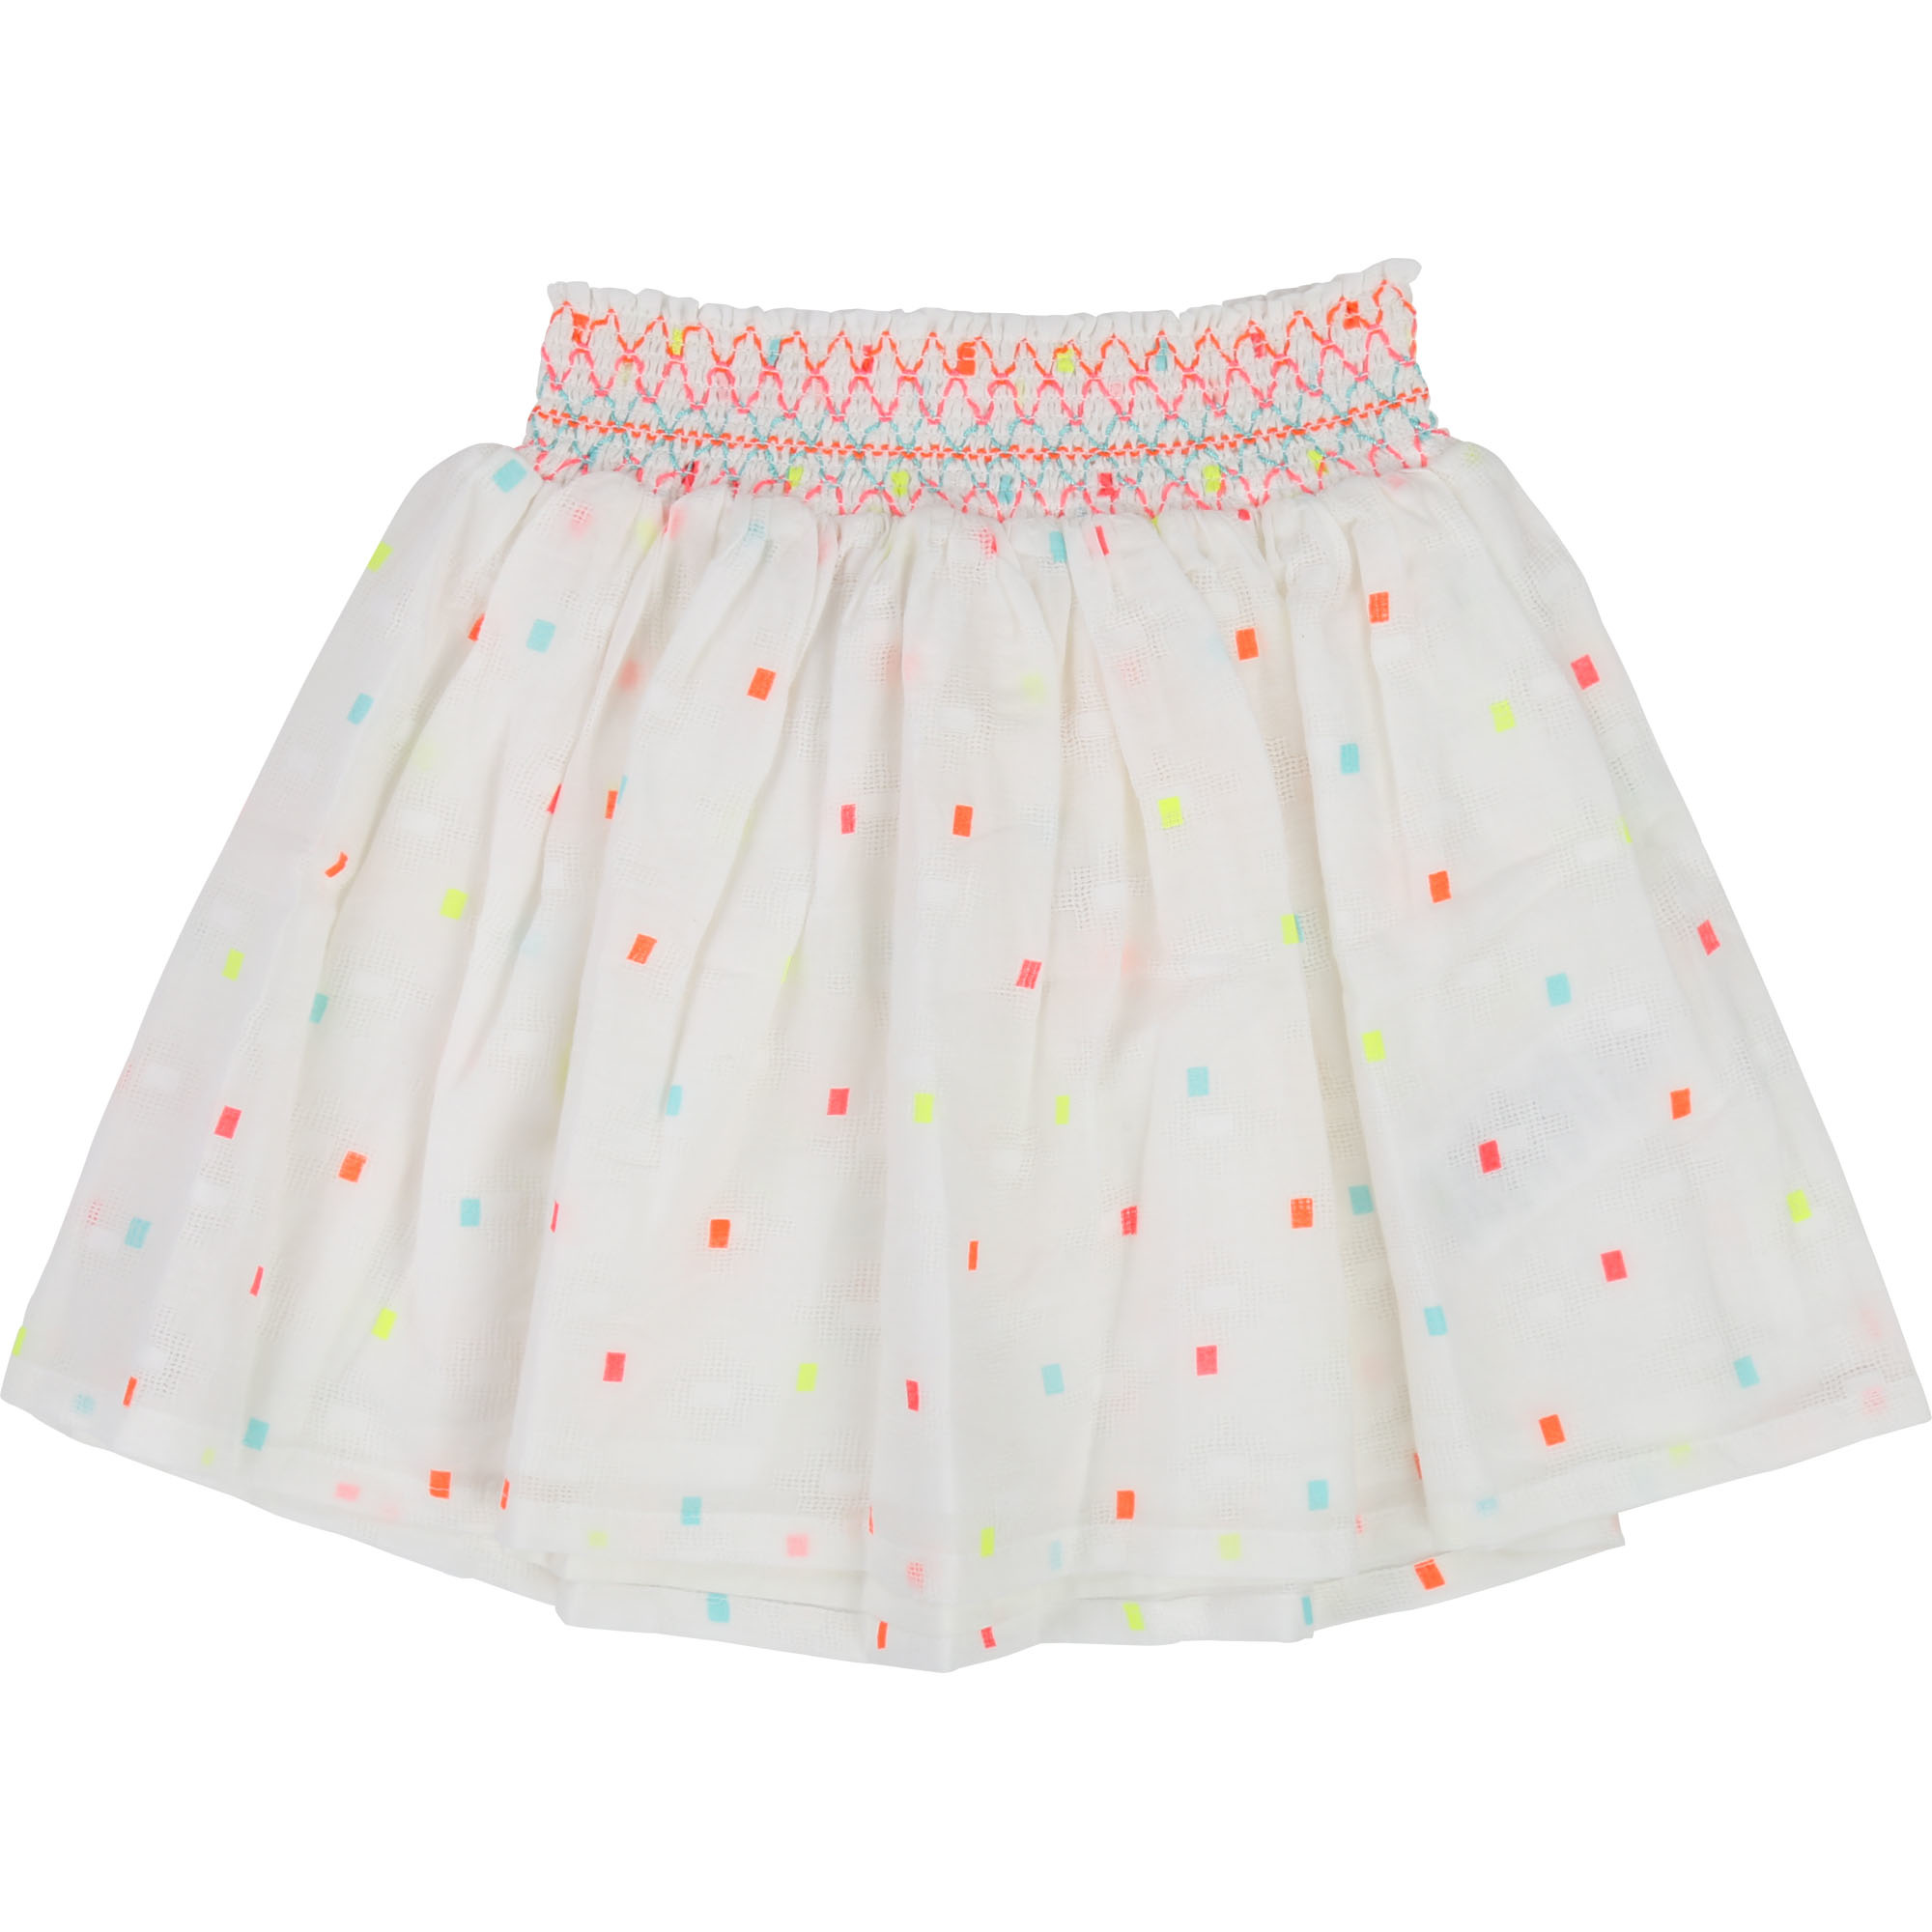 Billieblush White Neon Skirt